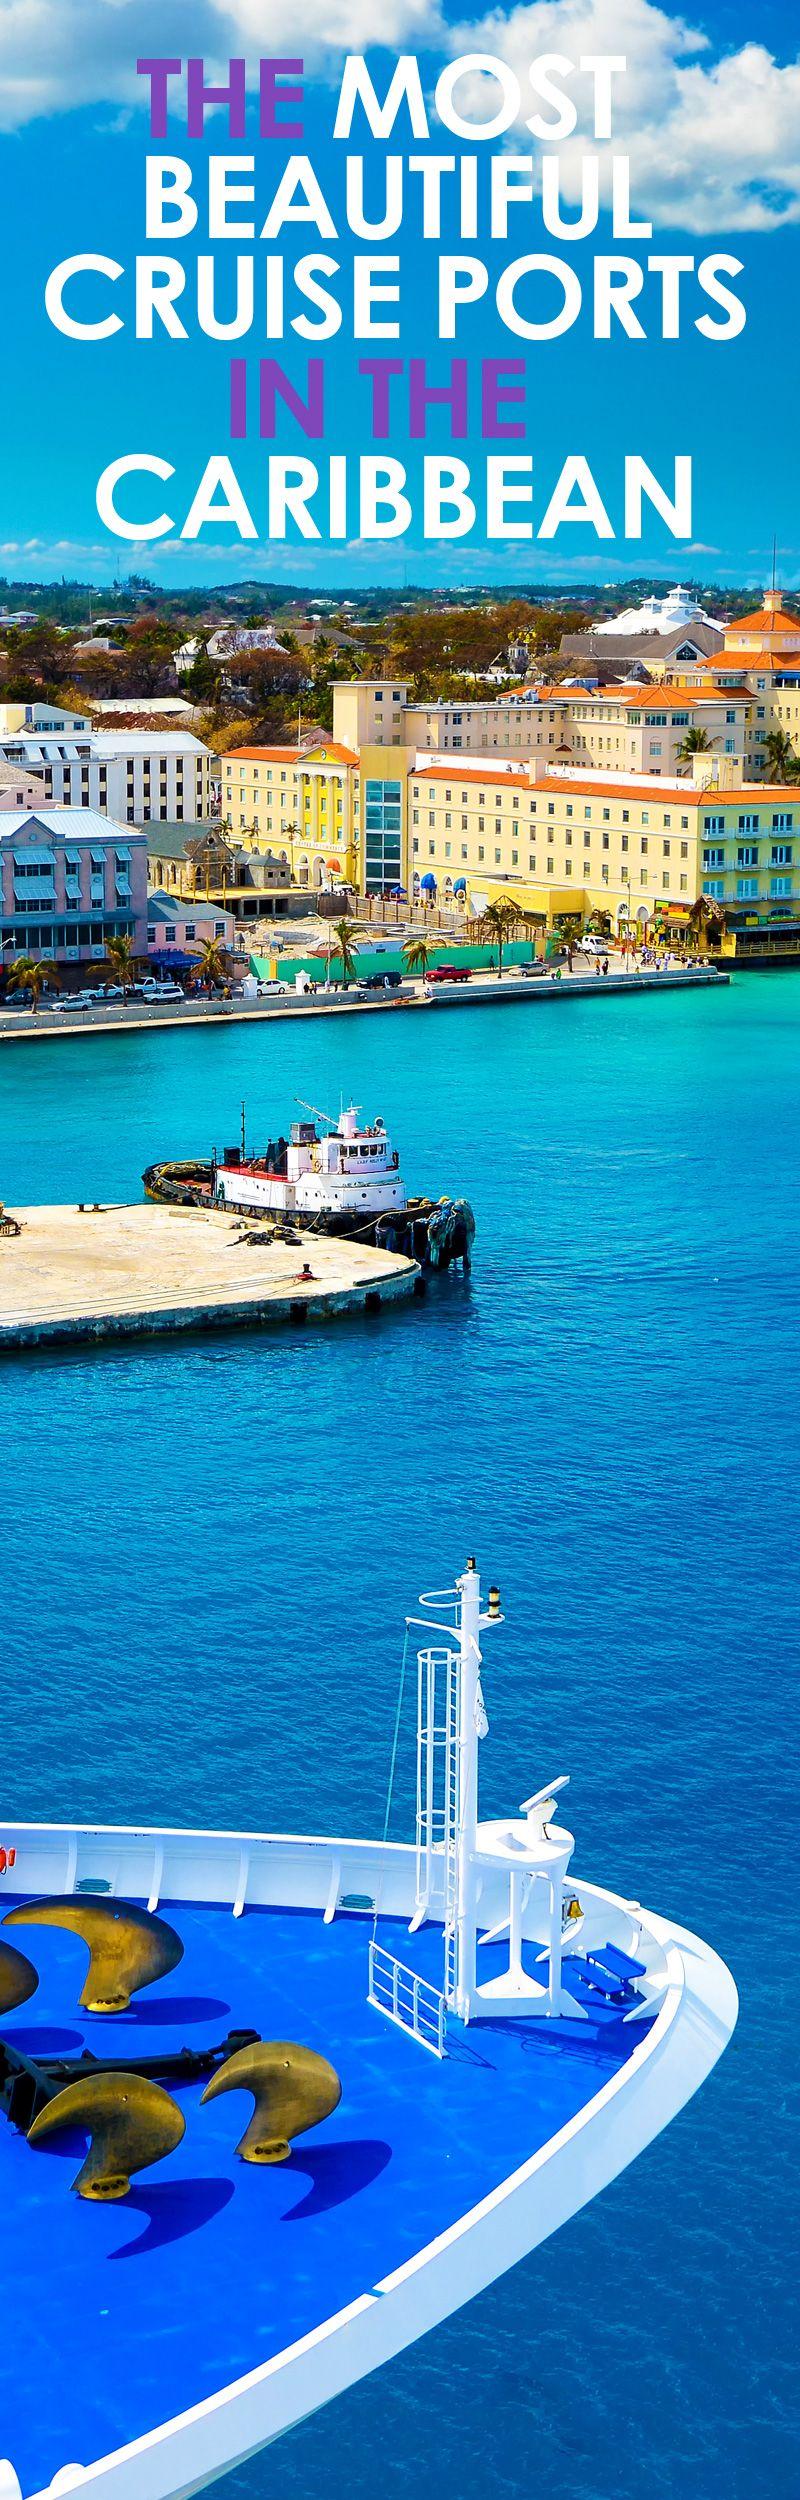 Celebrity Cruises - Seascanner.com